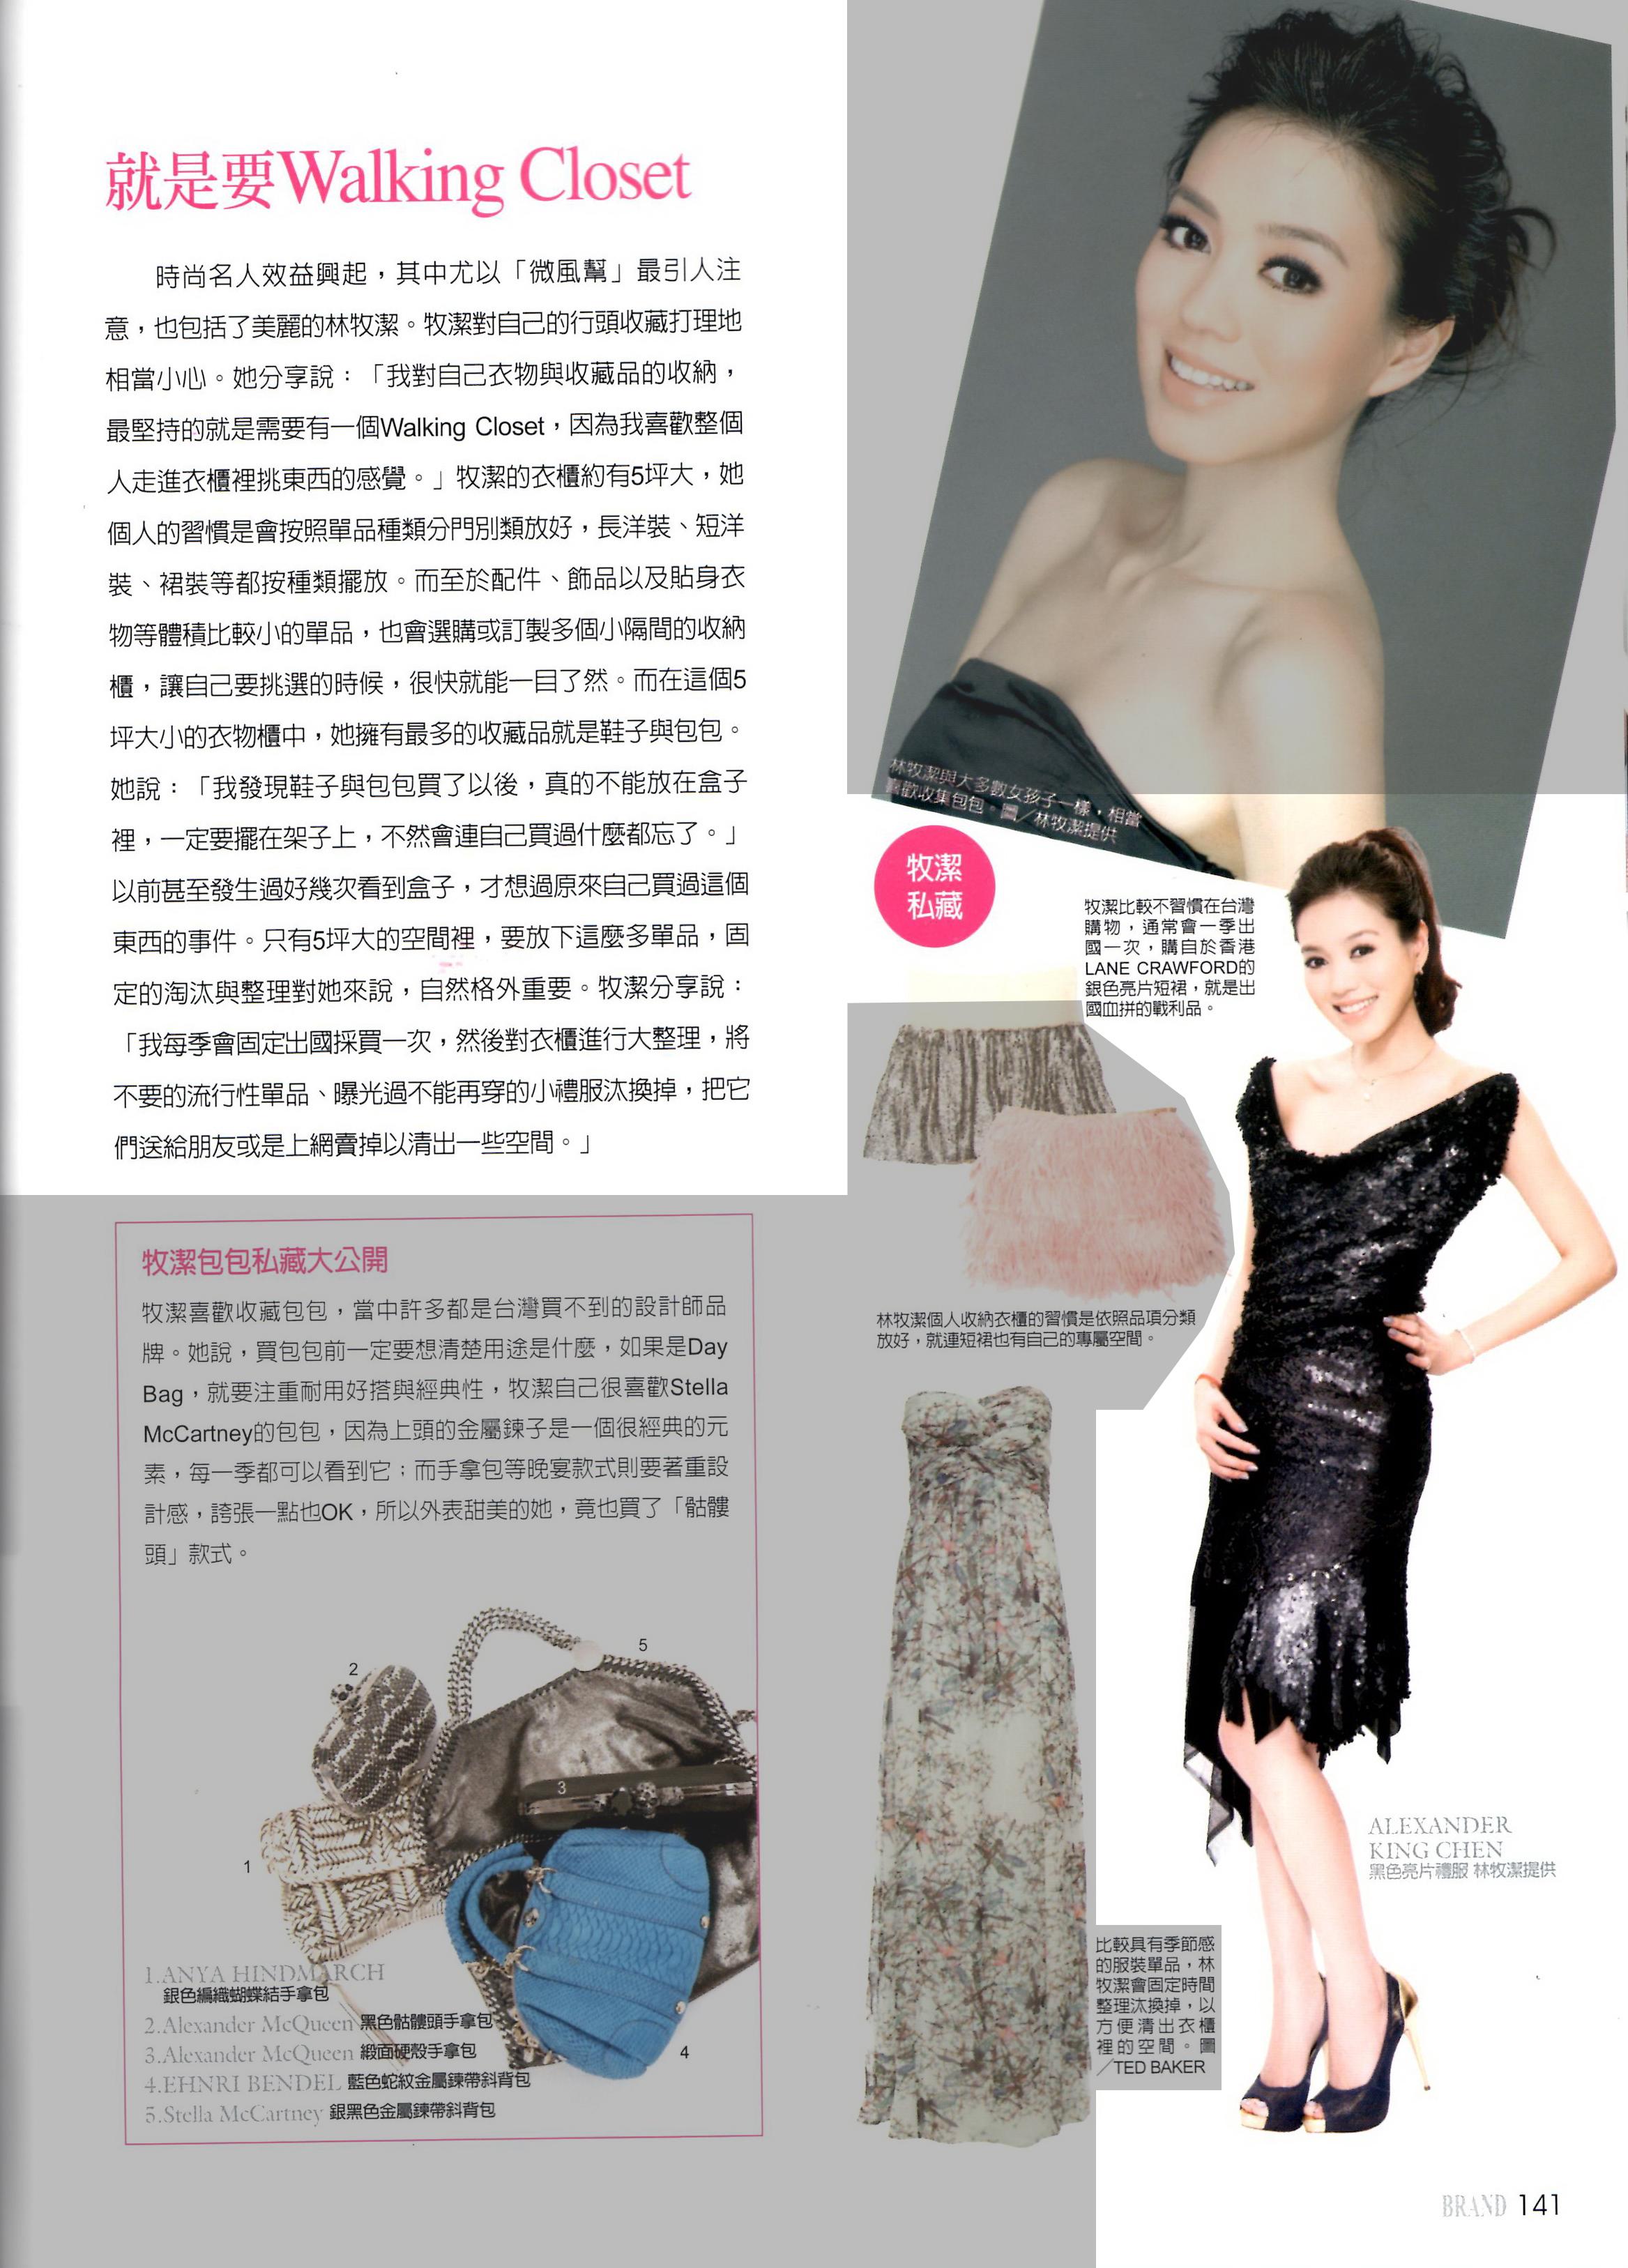 Jennifer Ling